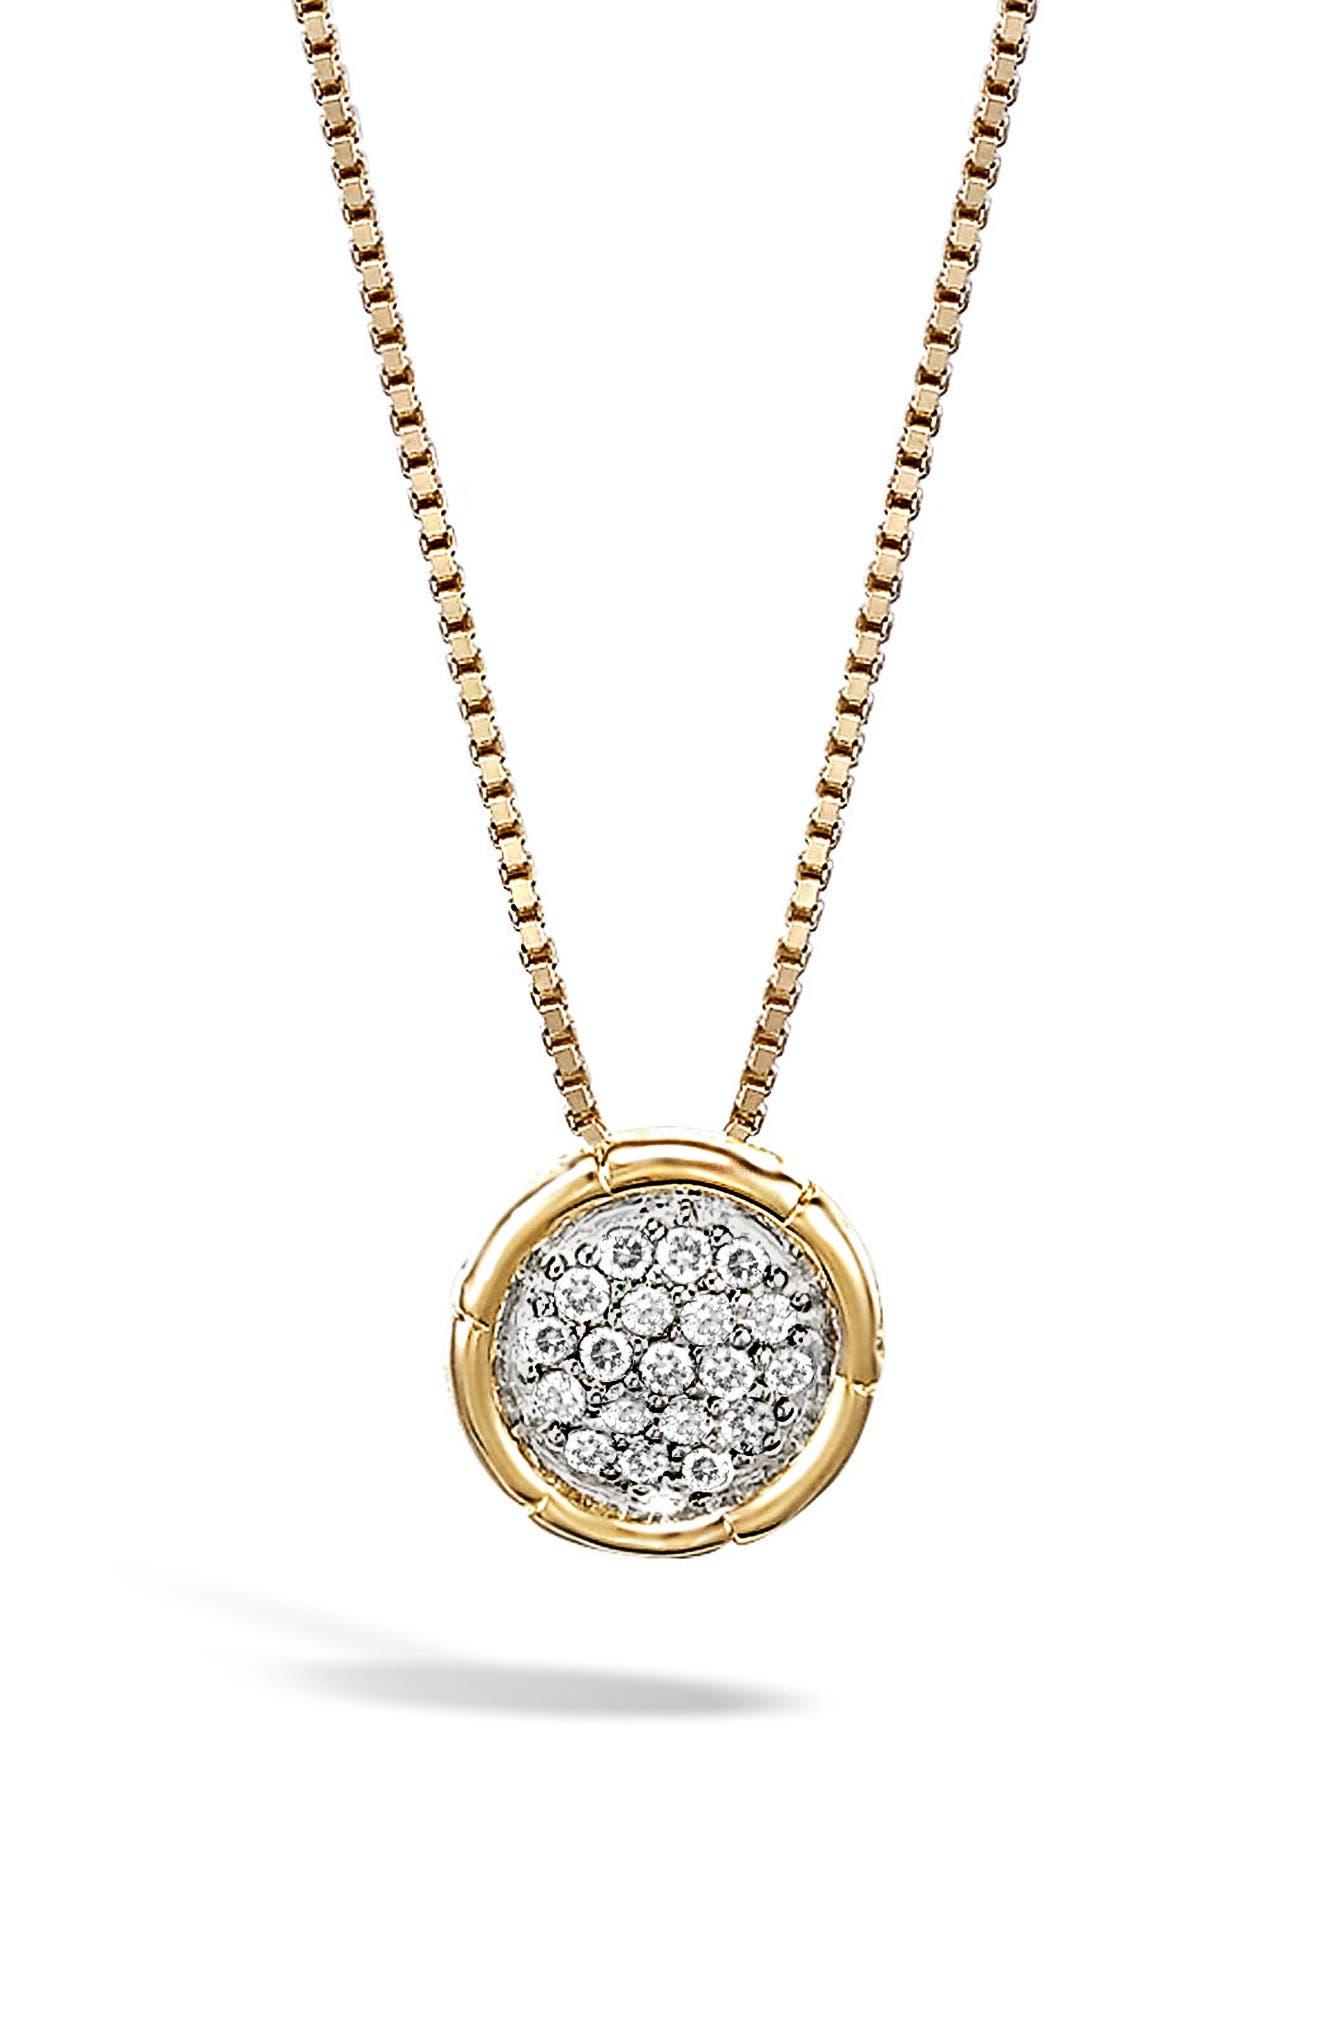 Main Image - John Hardy Bamboo Diamond Pendant Necklace